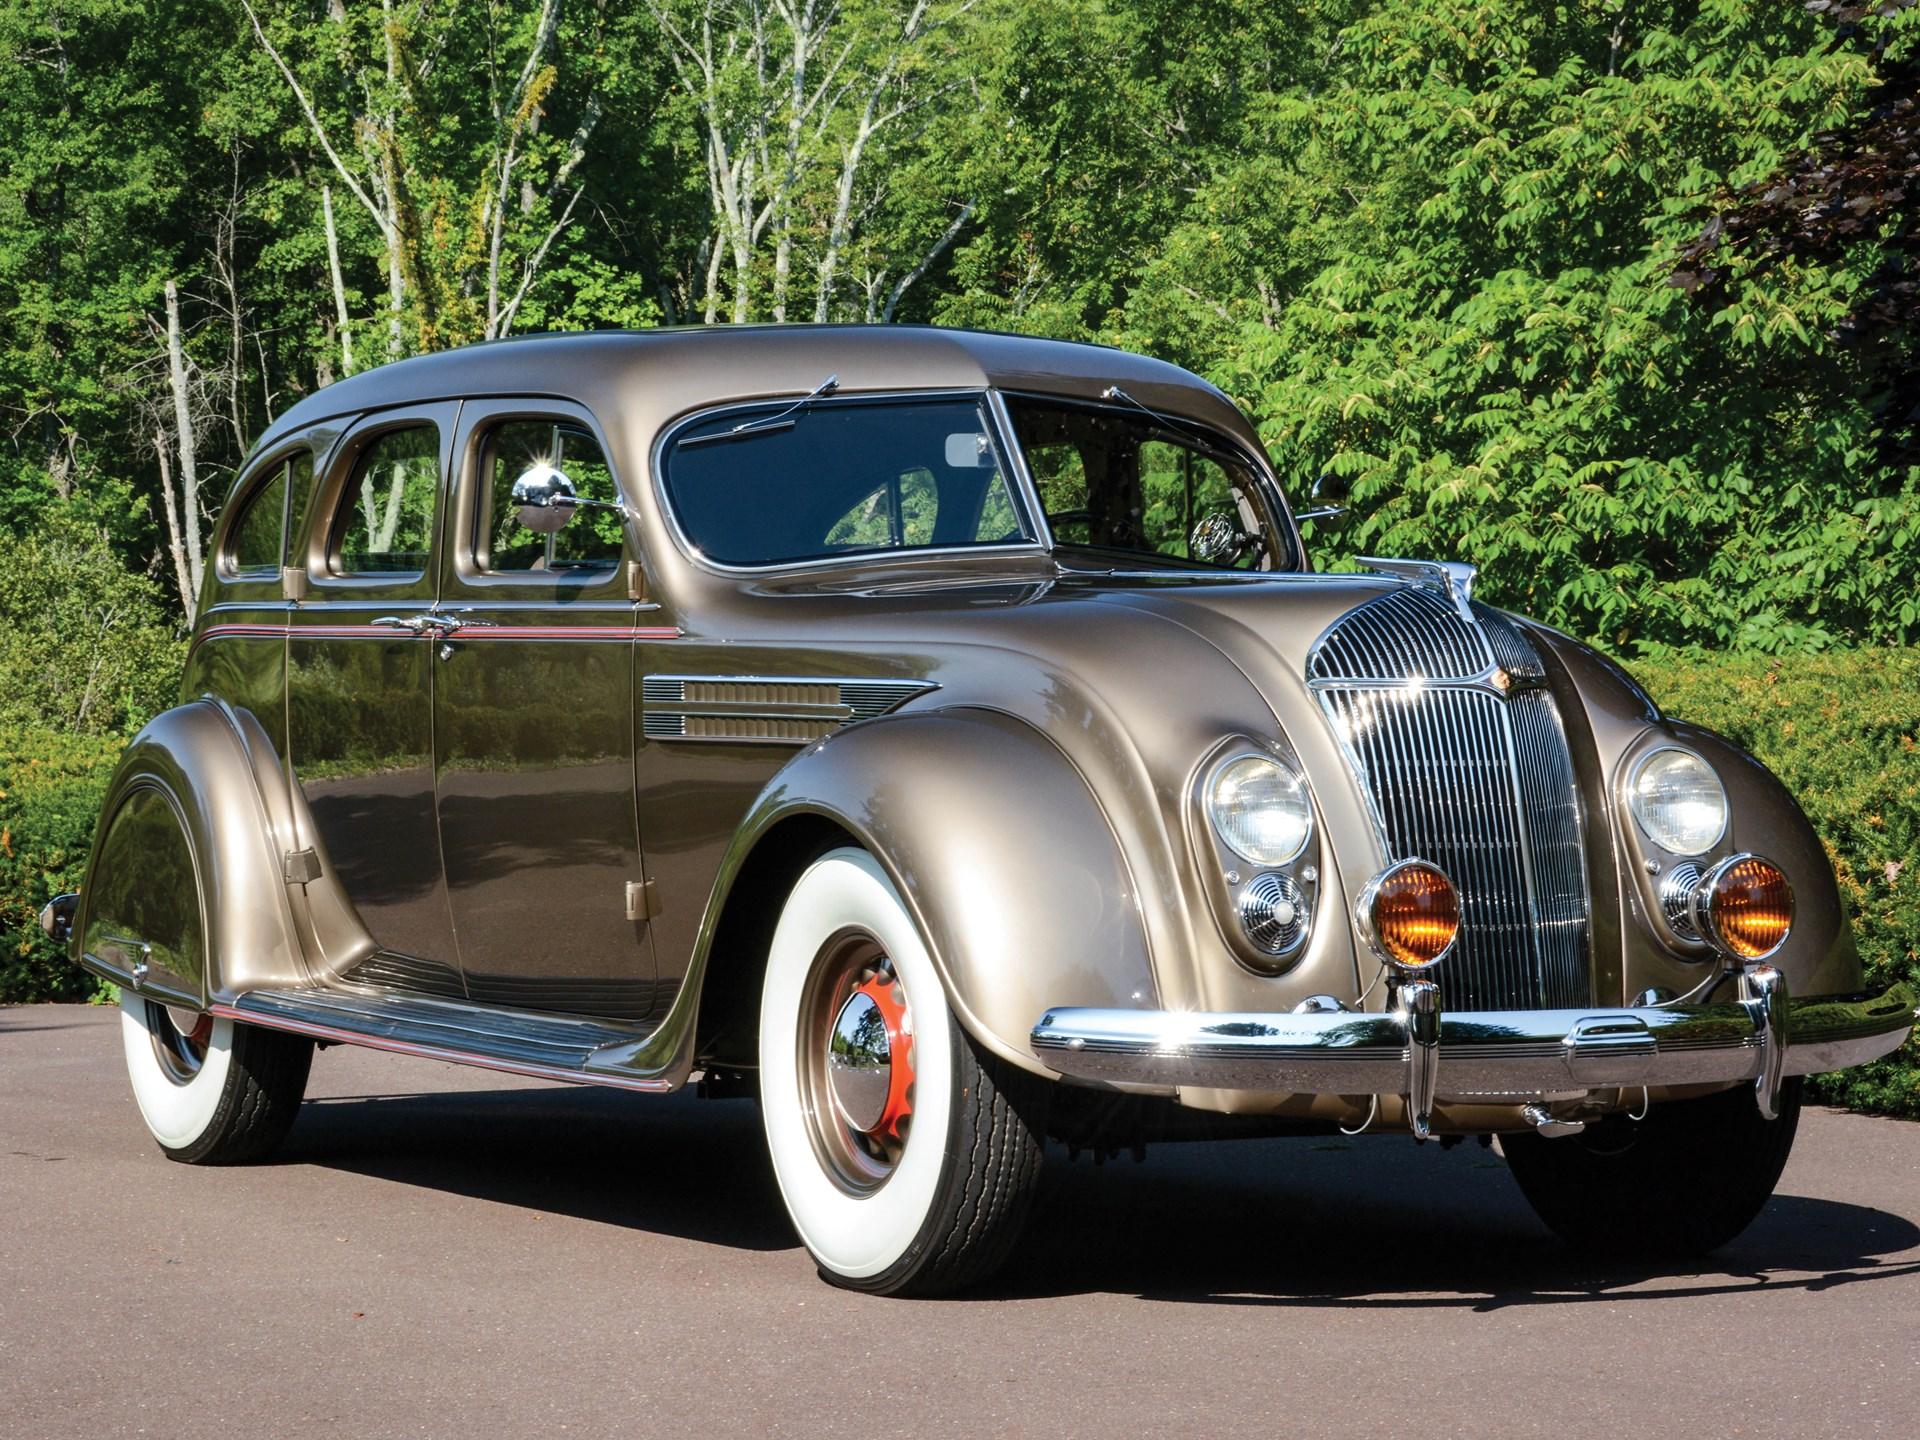 RM Sotheby's - 1936 Chrysler Imperial Airflow Sedan | Hershey 2015